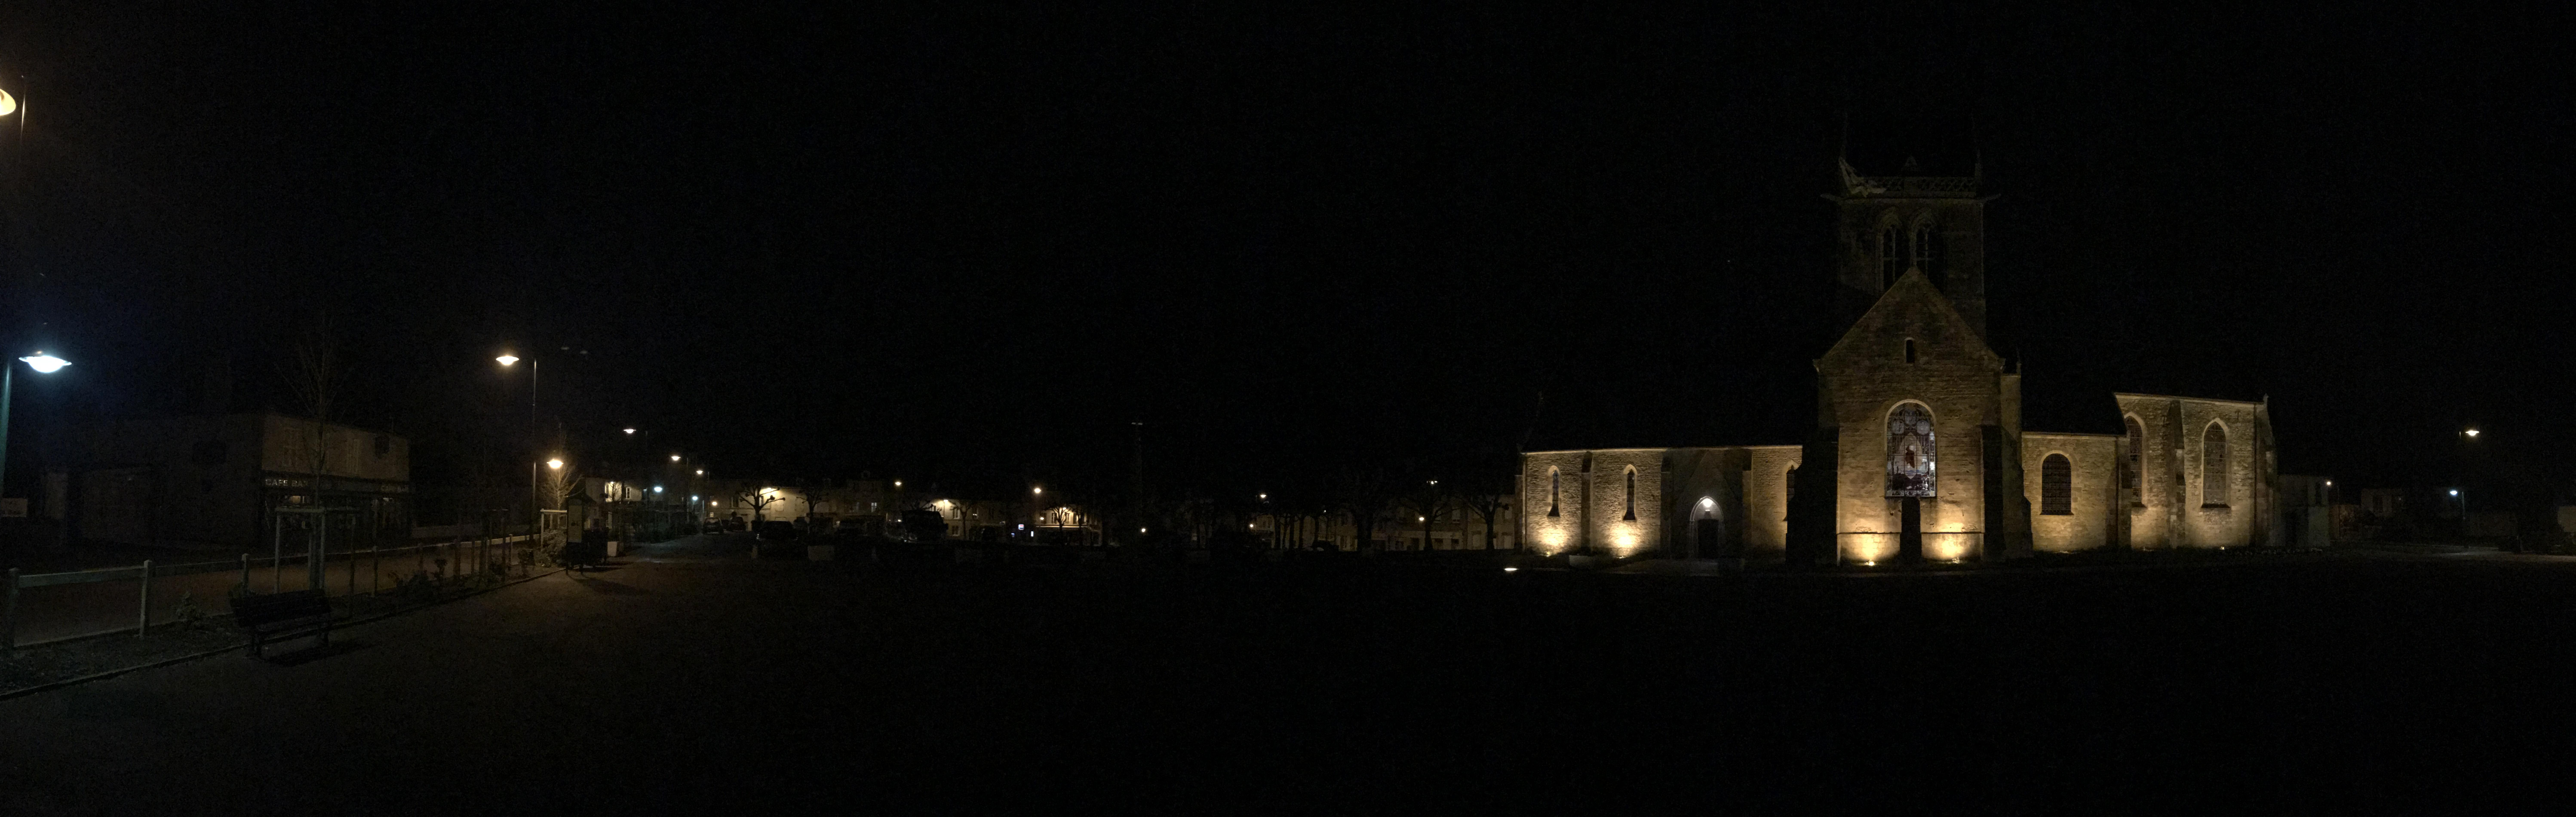 Sainte Mere night view.jpg